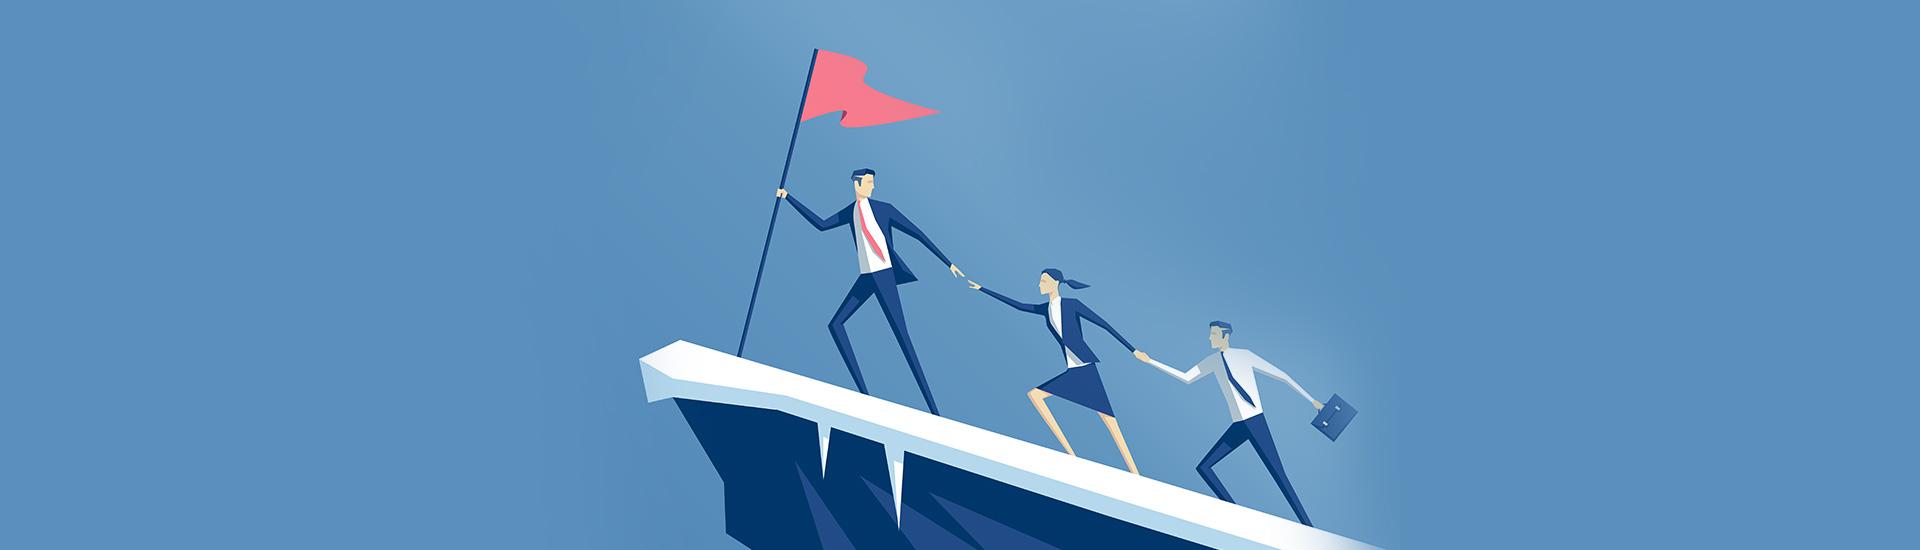 leadership & strategy image